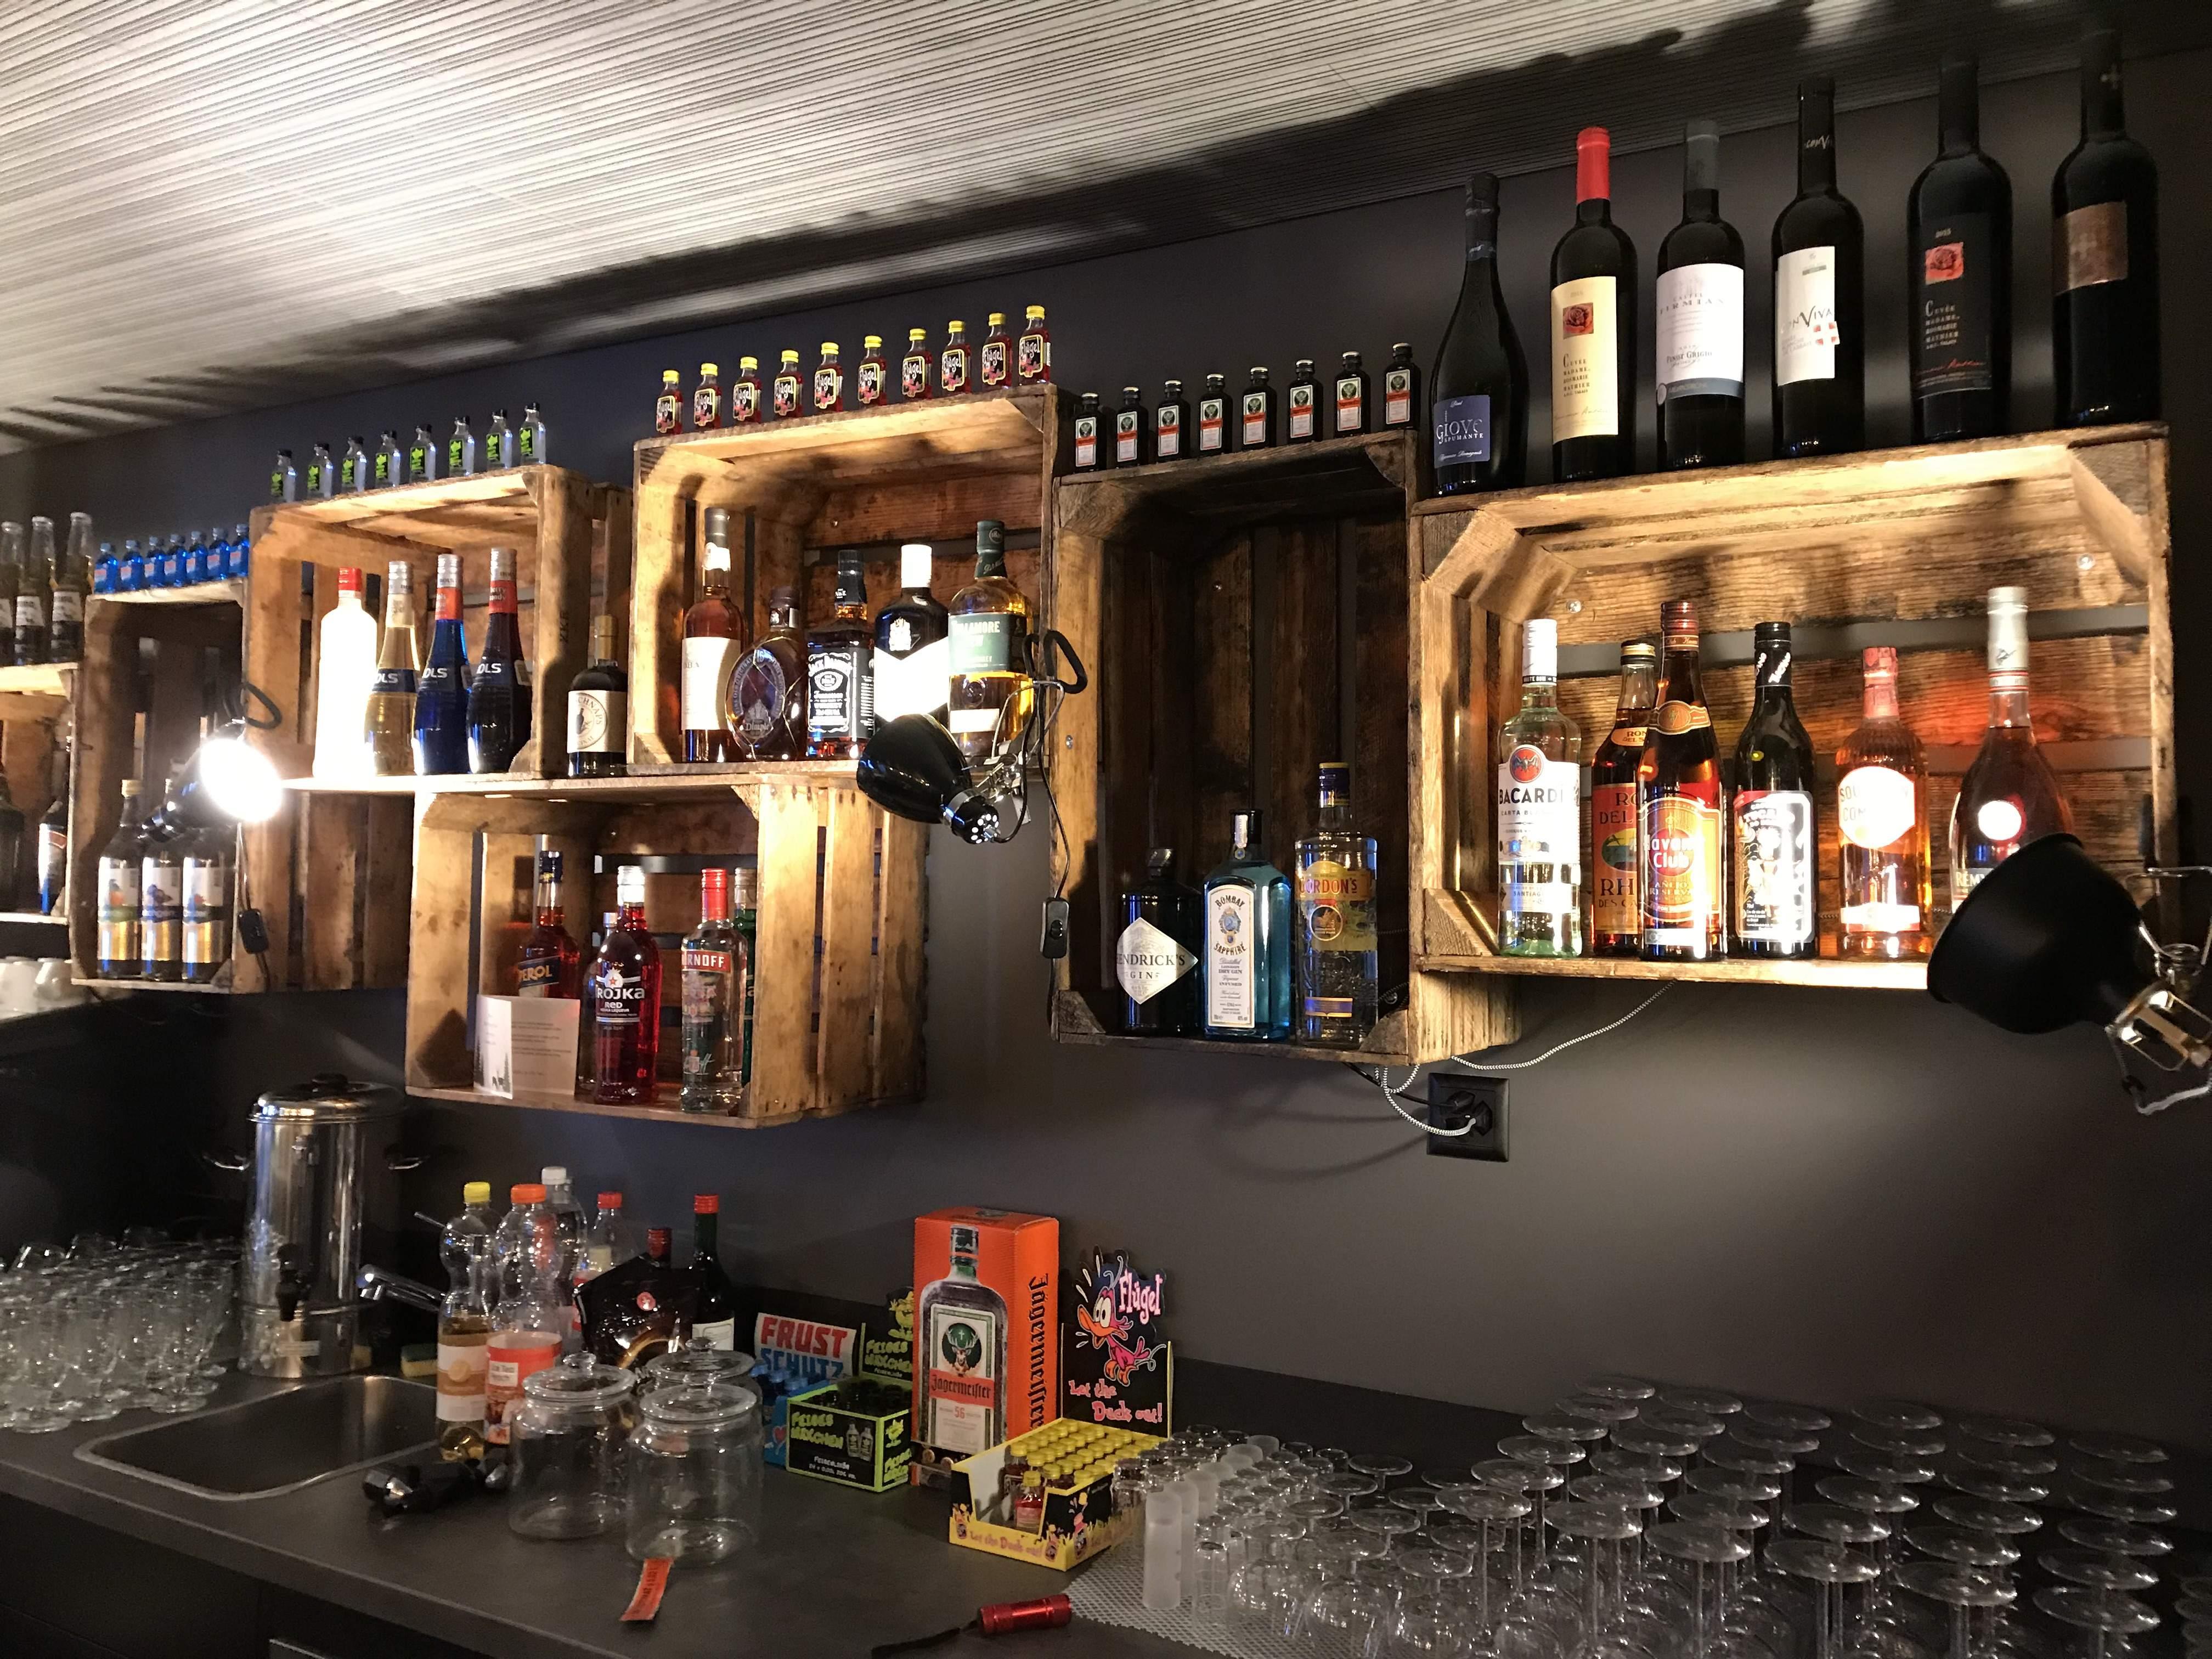 ofertas bebidas alcoholicas walmart caja madrid viviendas ofertas